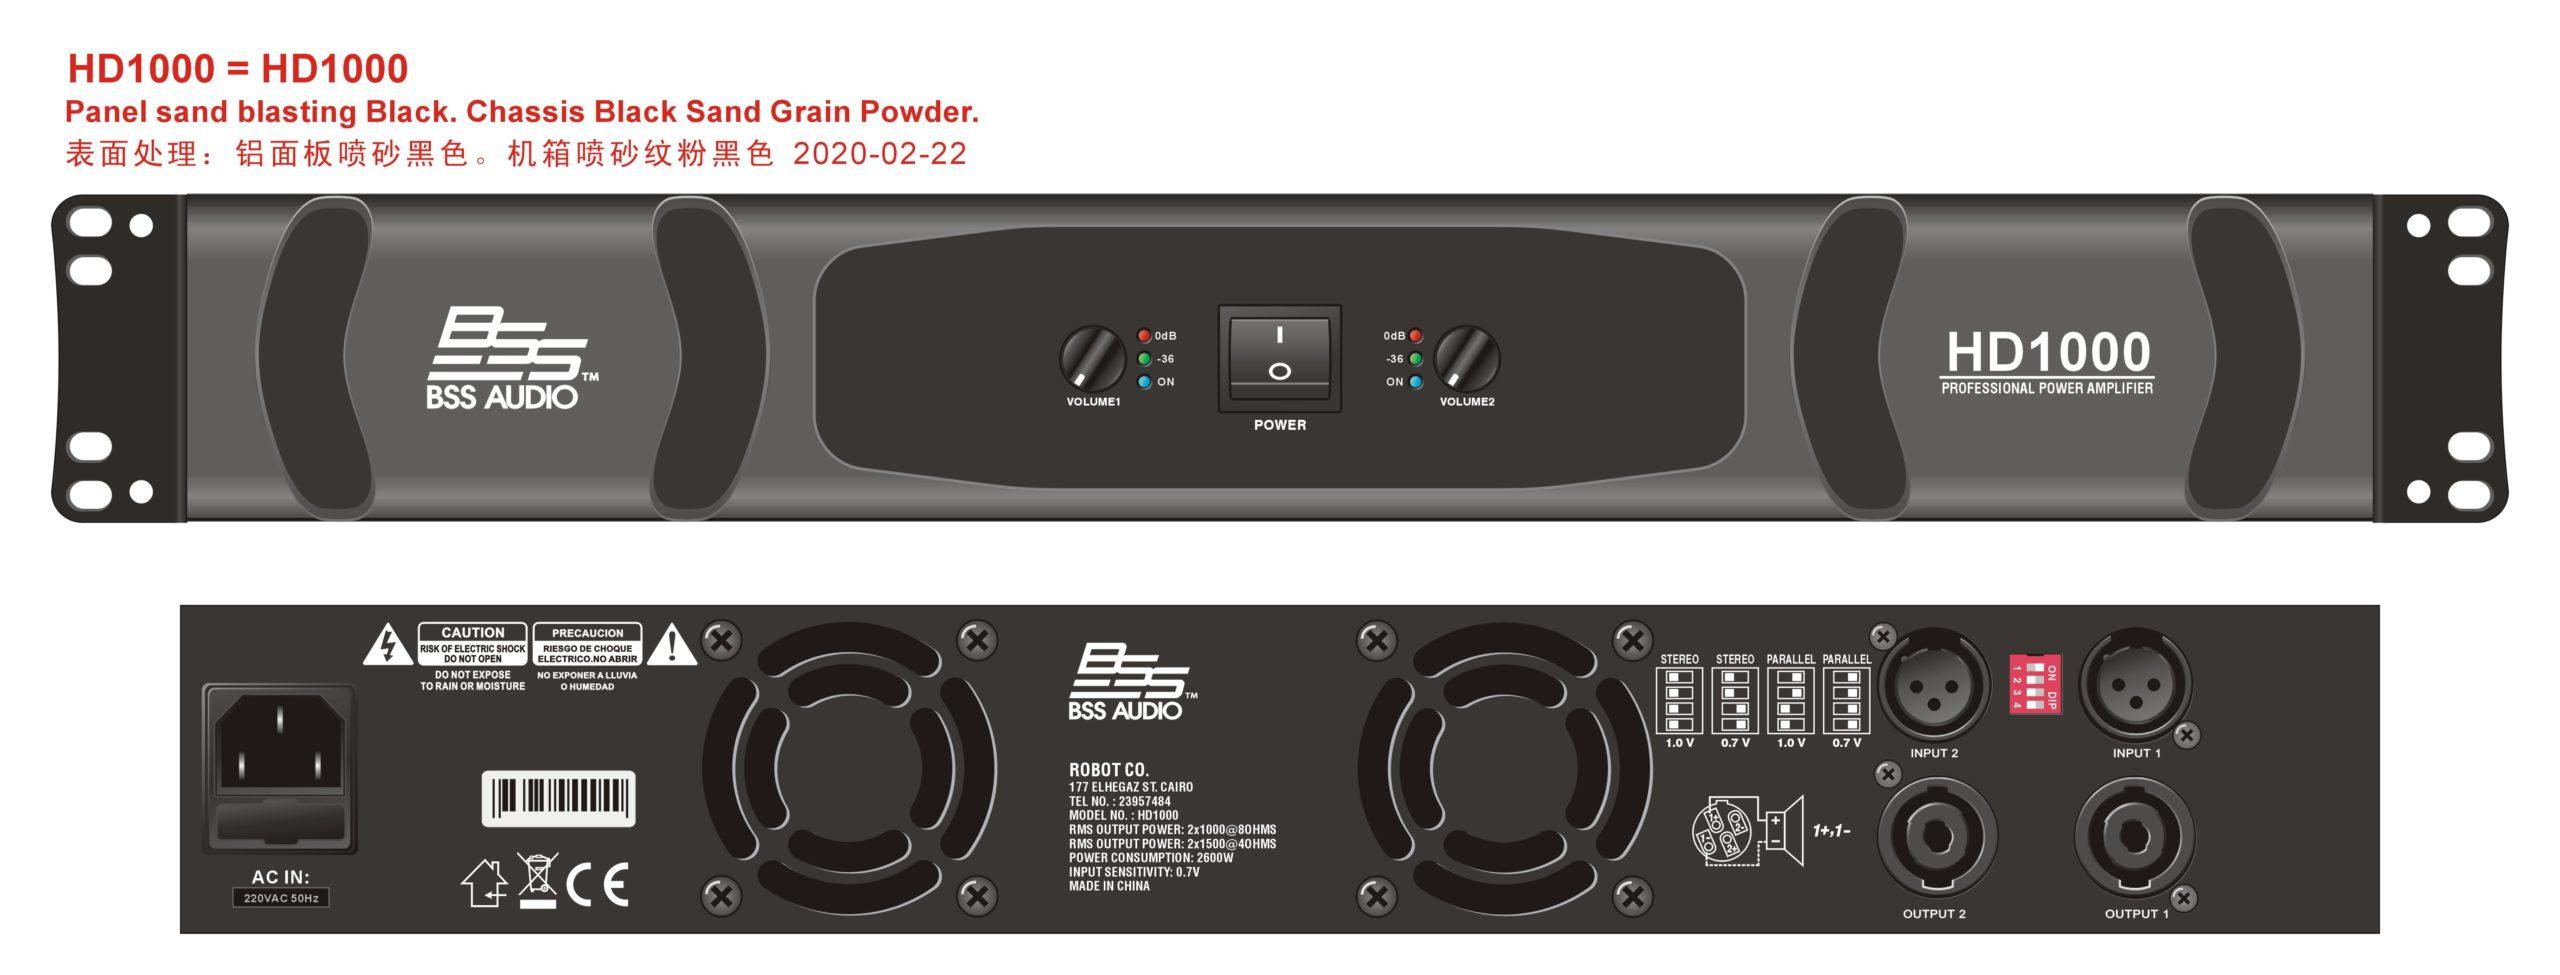 HD1000 ARTWORK